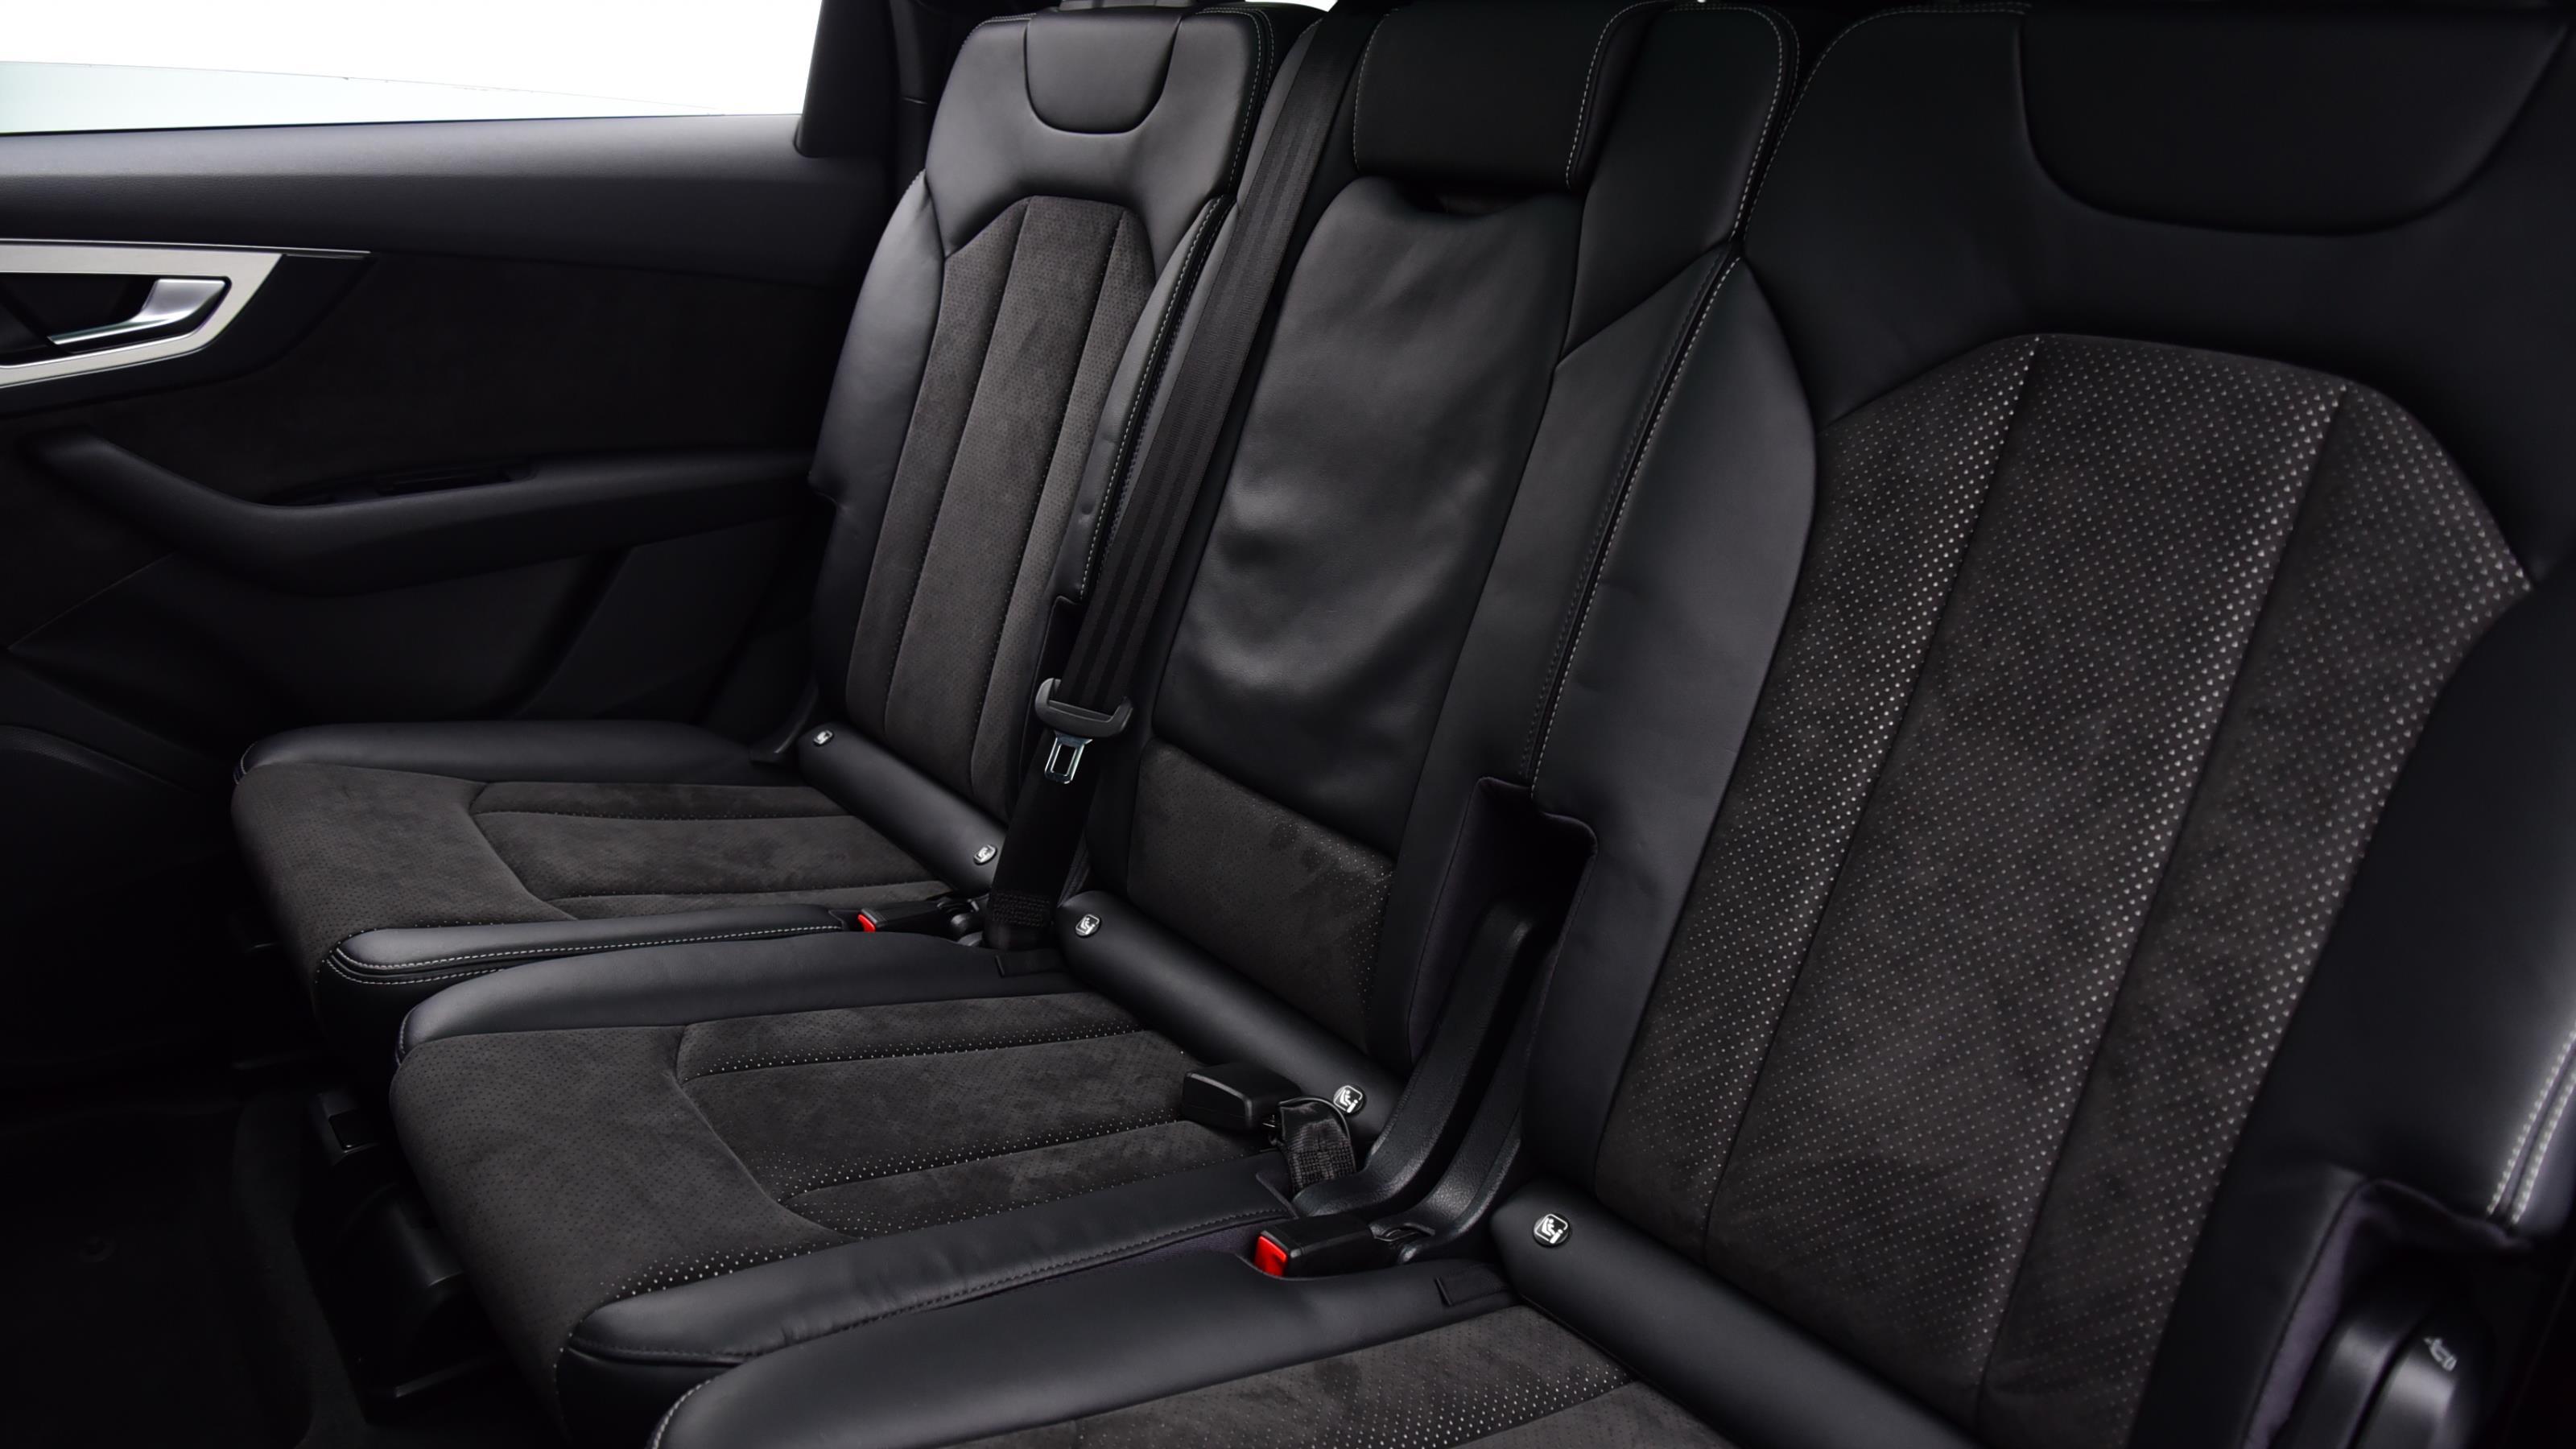 Used 2016 Audi Q7 3.0 TDI Quattro S Line 5dr Tip Auto GREY at Saxton4x4